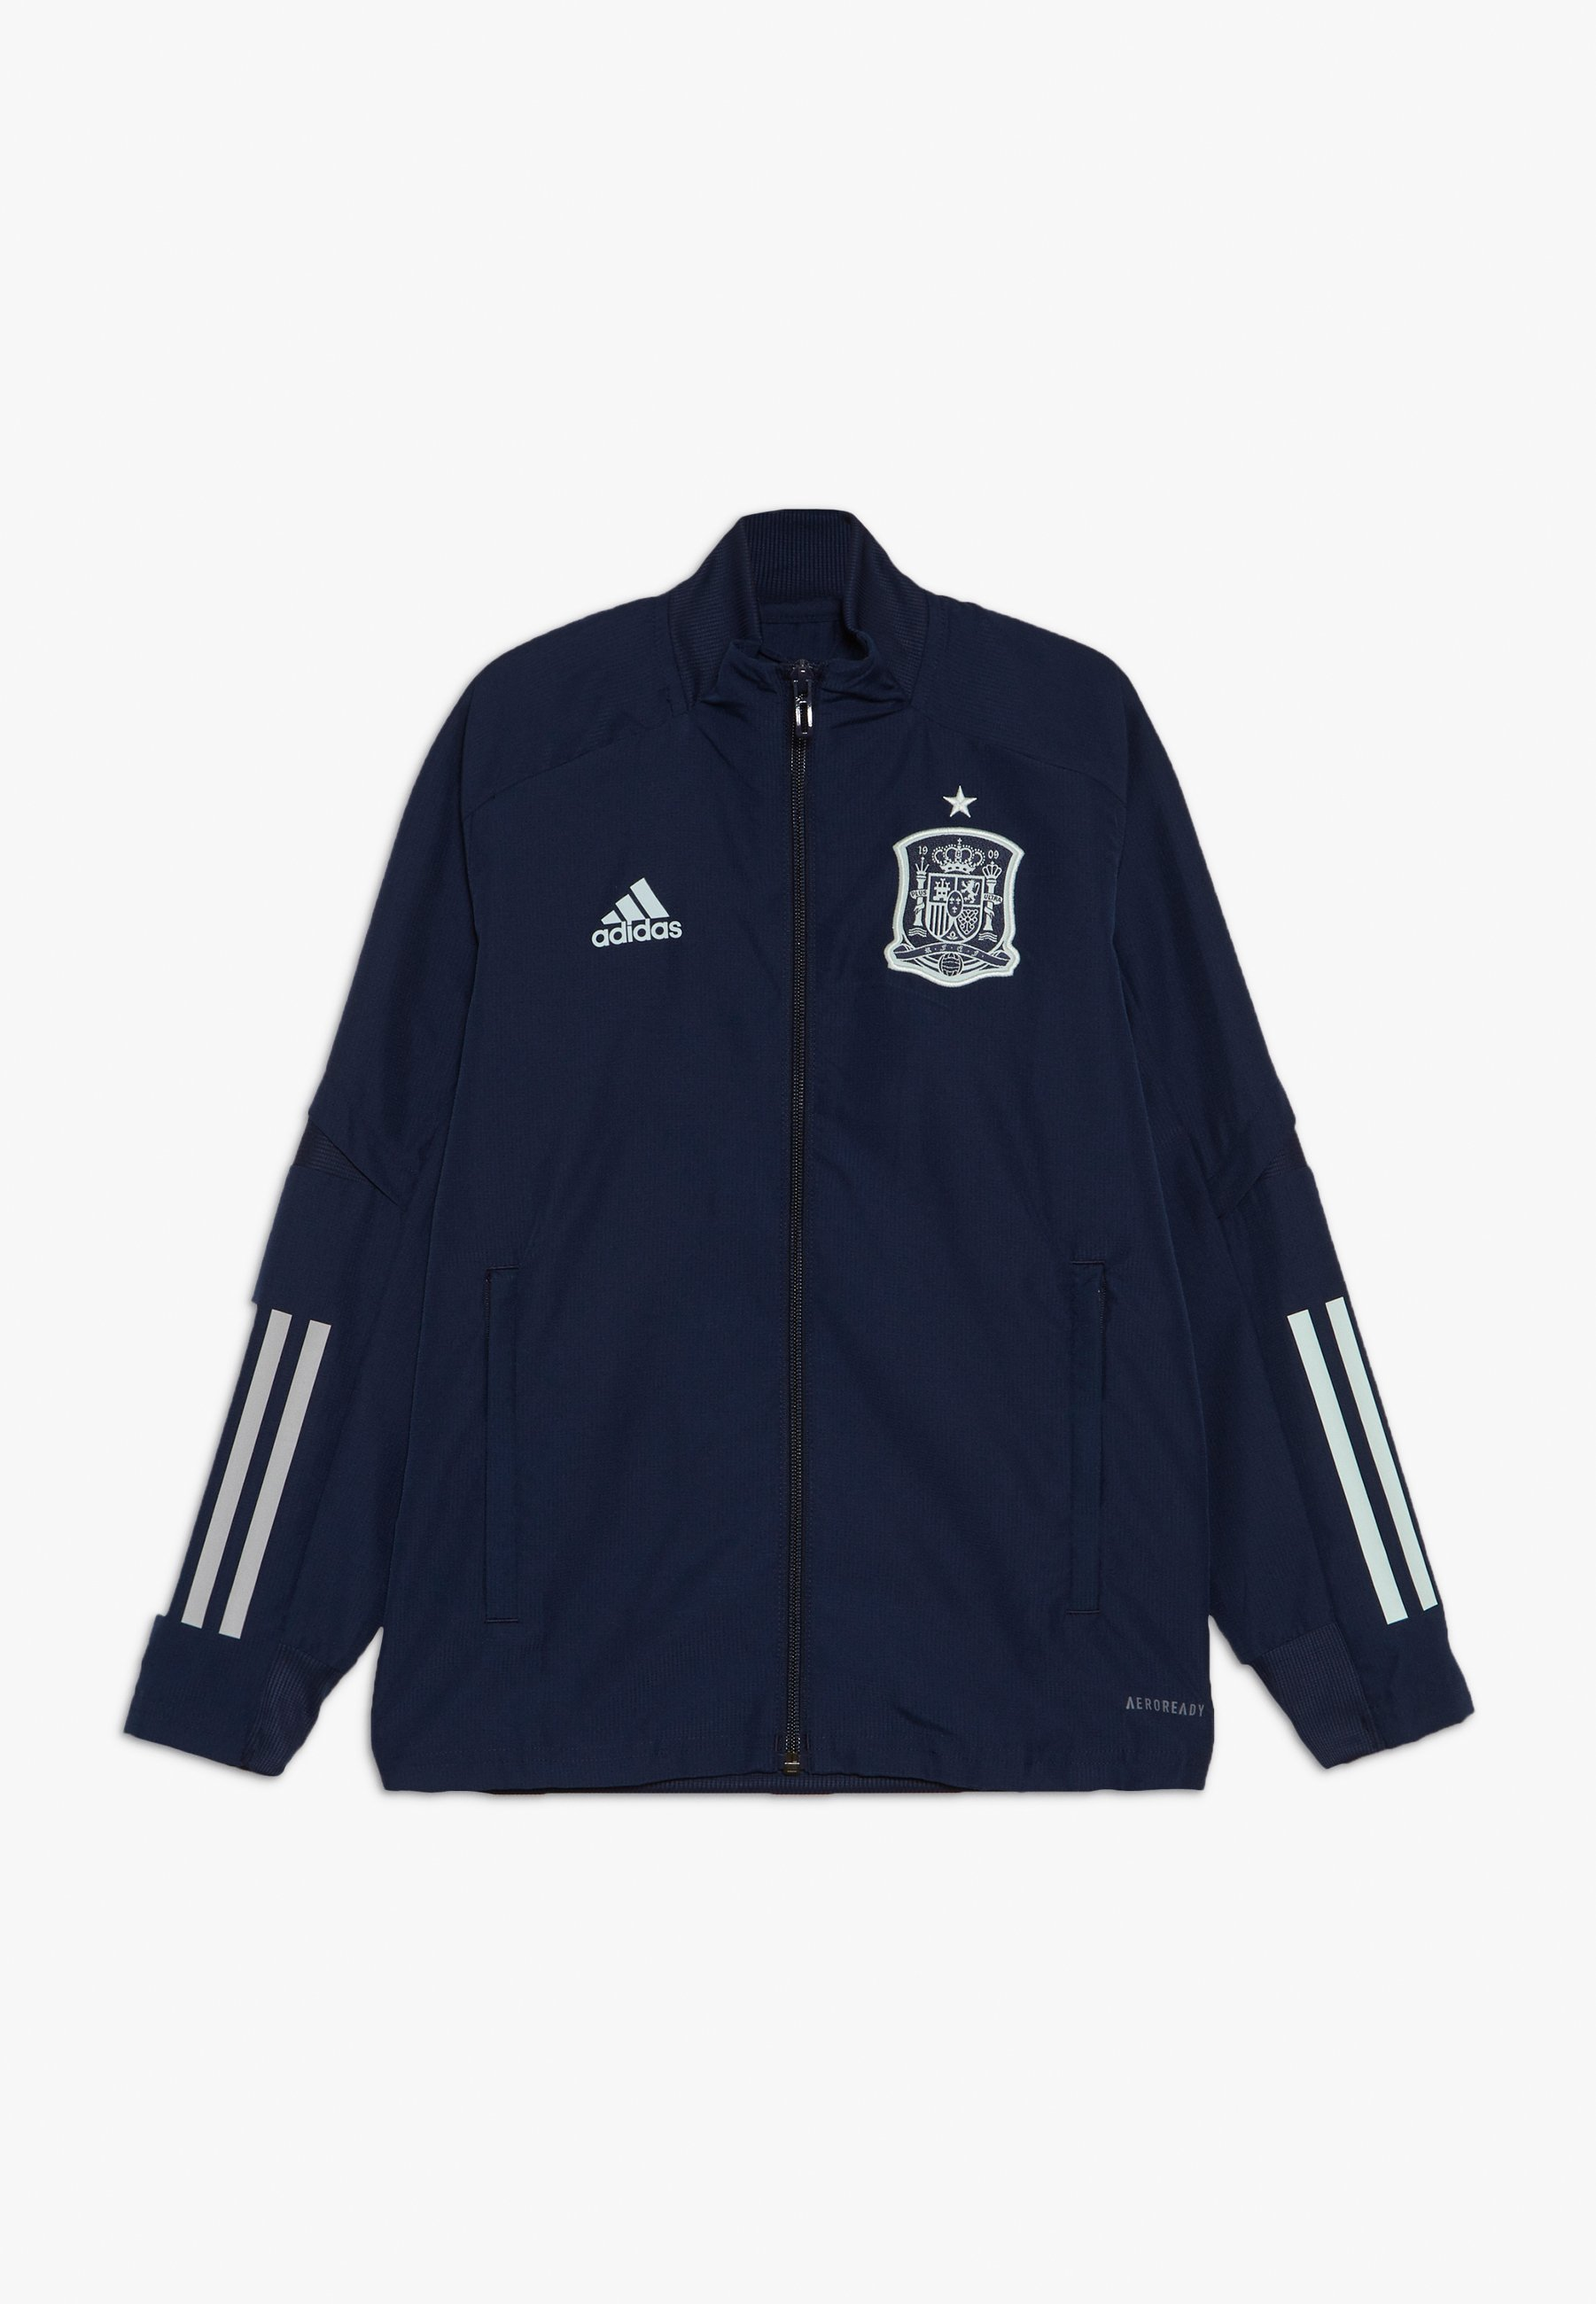 Kids SPAIN FEF PRESENTATION JACKET - National team wear